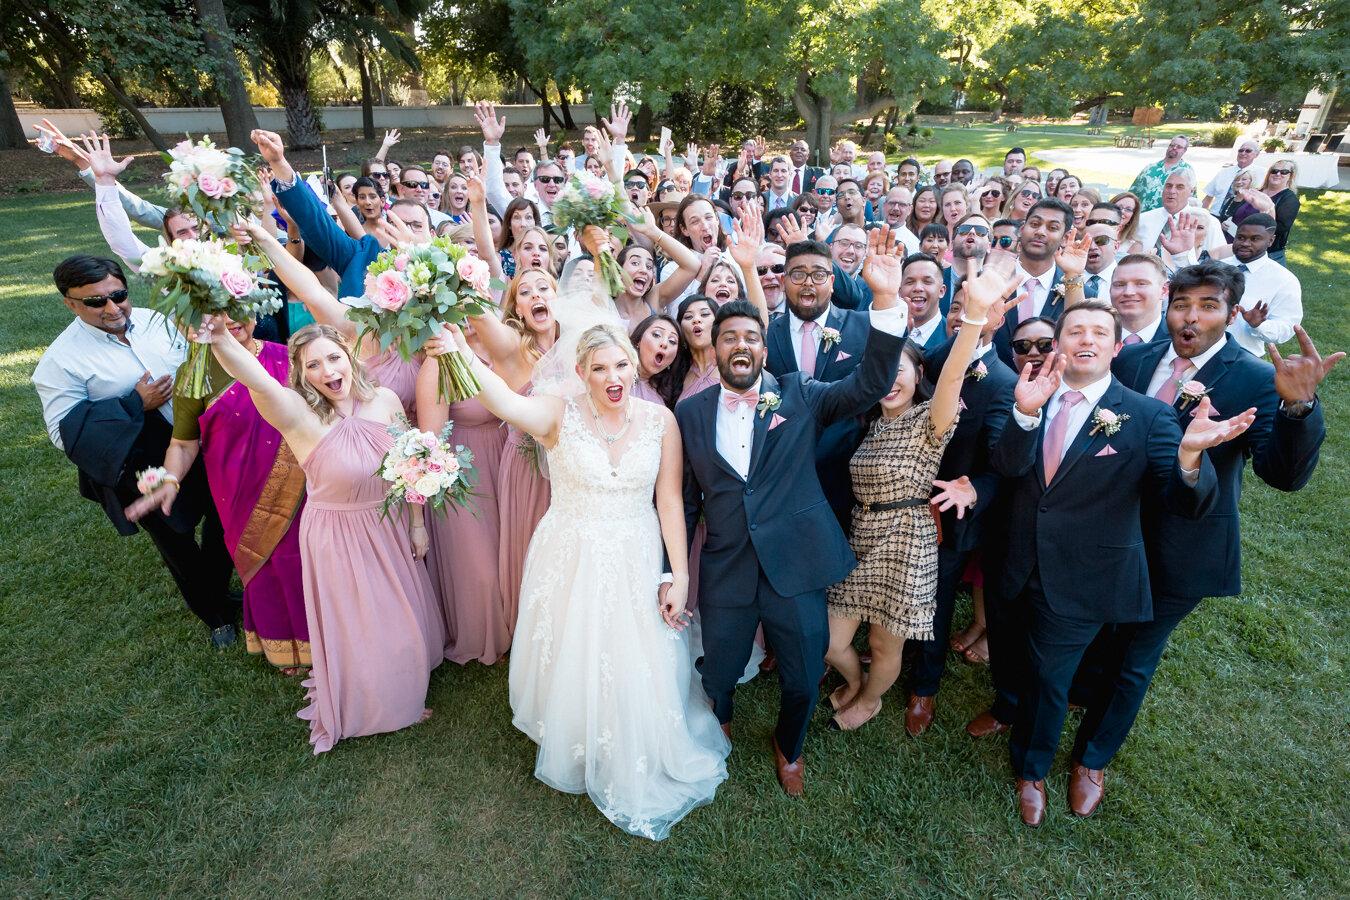 2019.08.24_Emily-Ashir-Wedding-at-the-Maples-5934.jpg